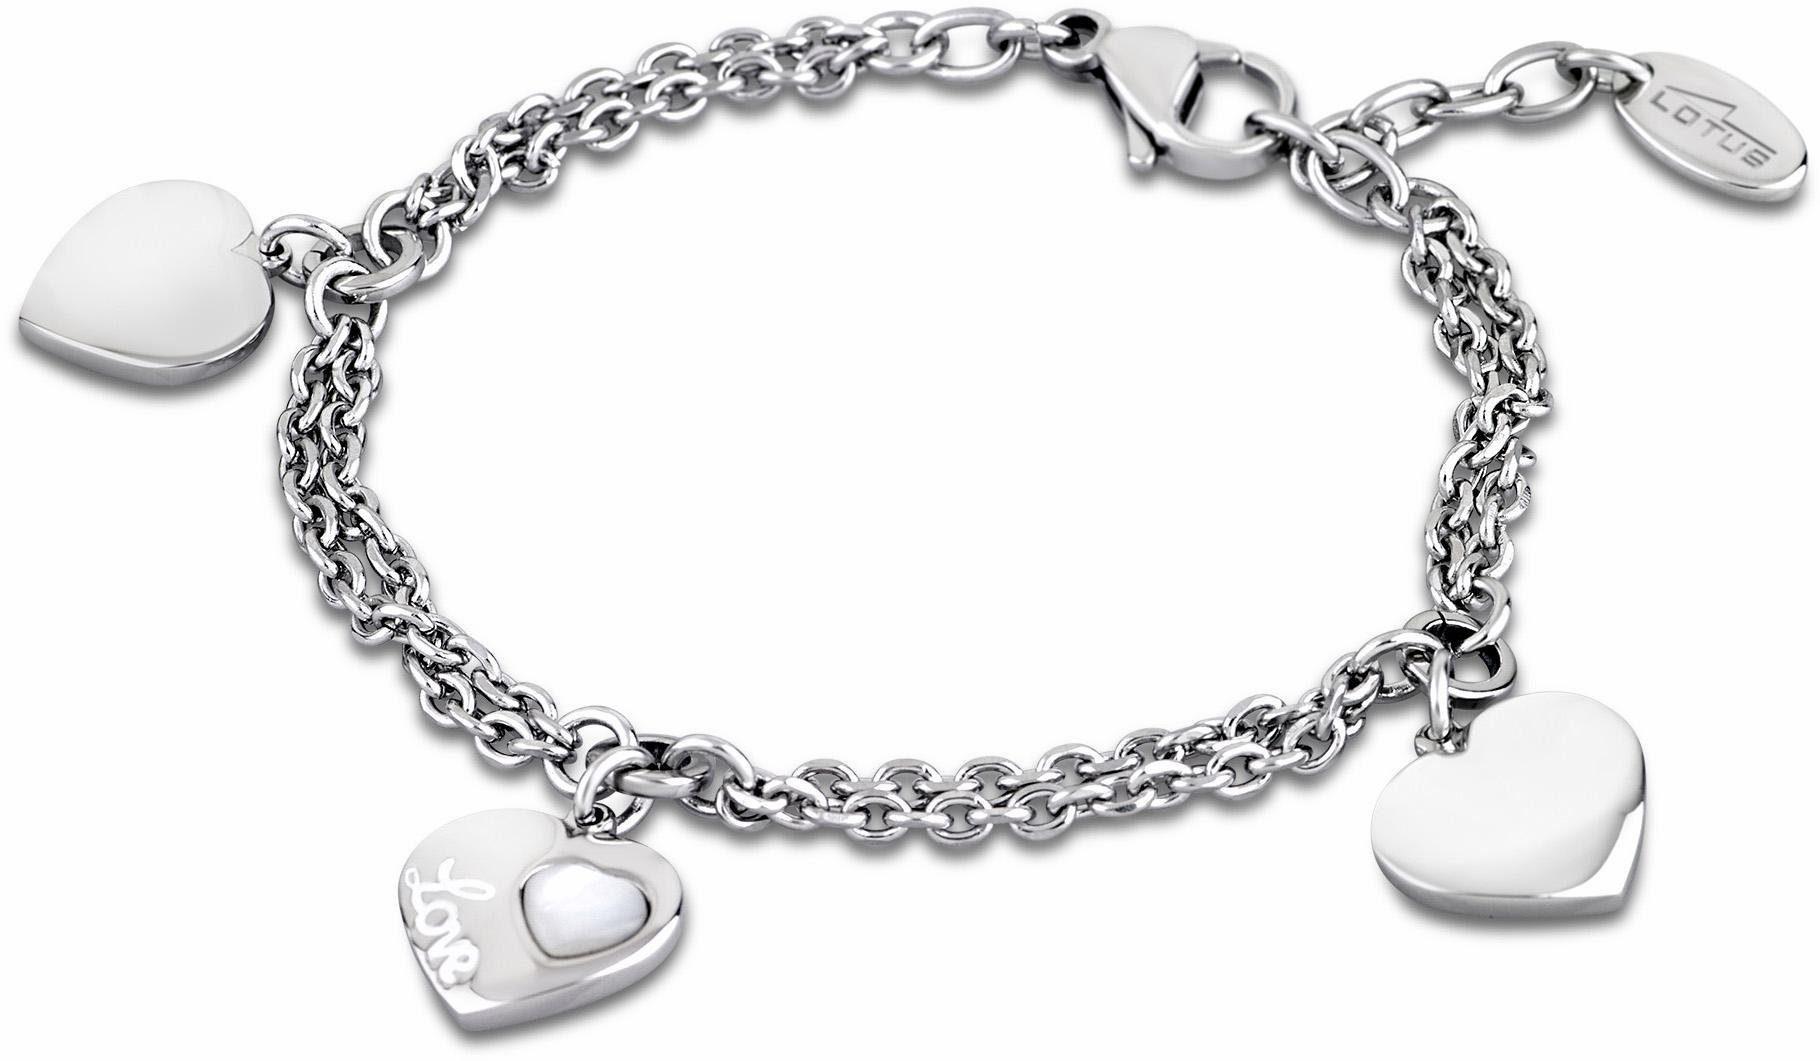 Lotus Style Armband »Armband, Woman´s Heart, LS1748-2/1« mit Perlmutteinlage